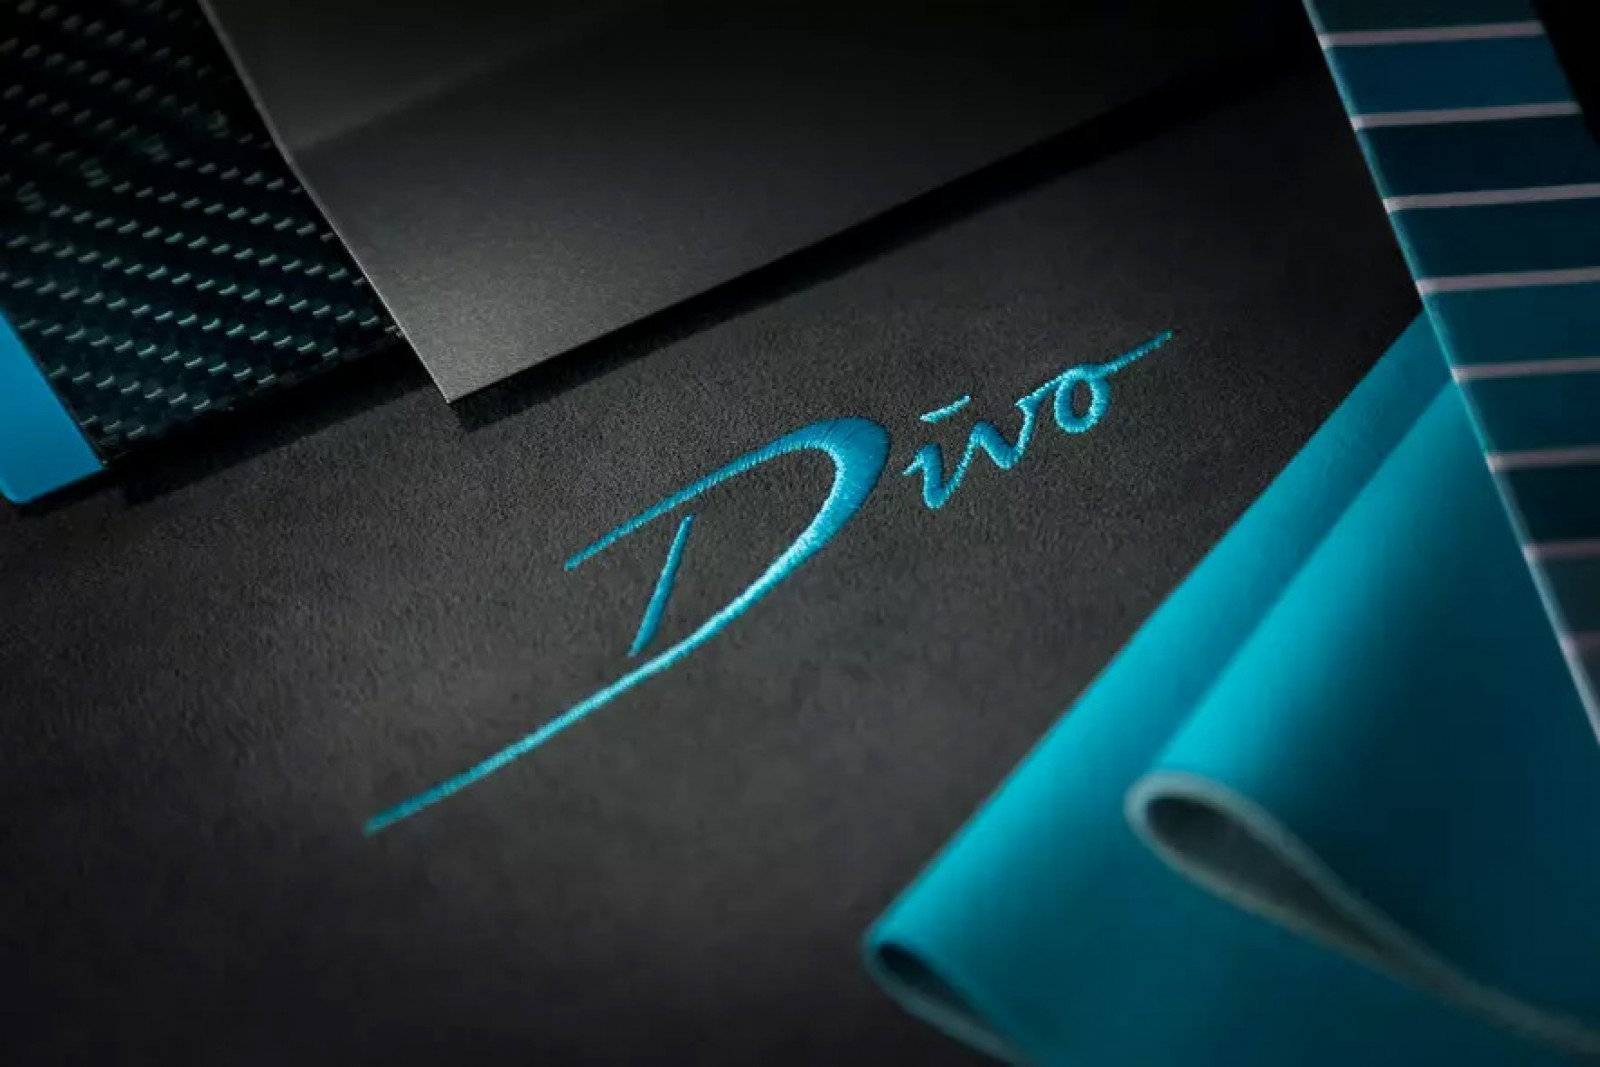 (foto) Premiera mondială a noului Bugatti Divo va avea loc la 24 august 2018